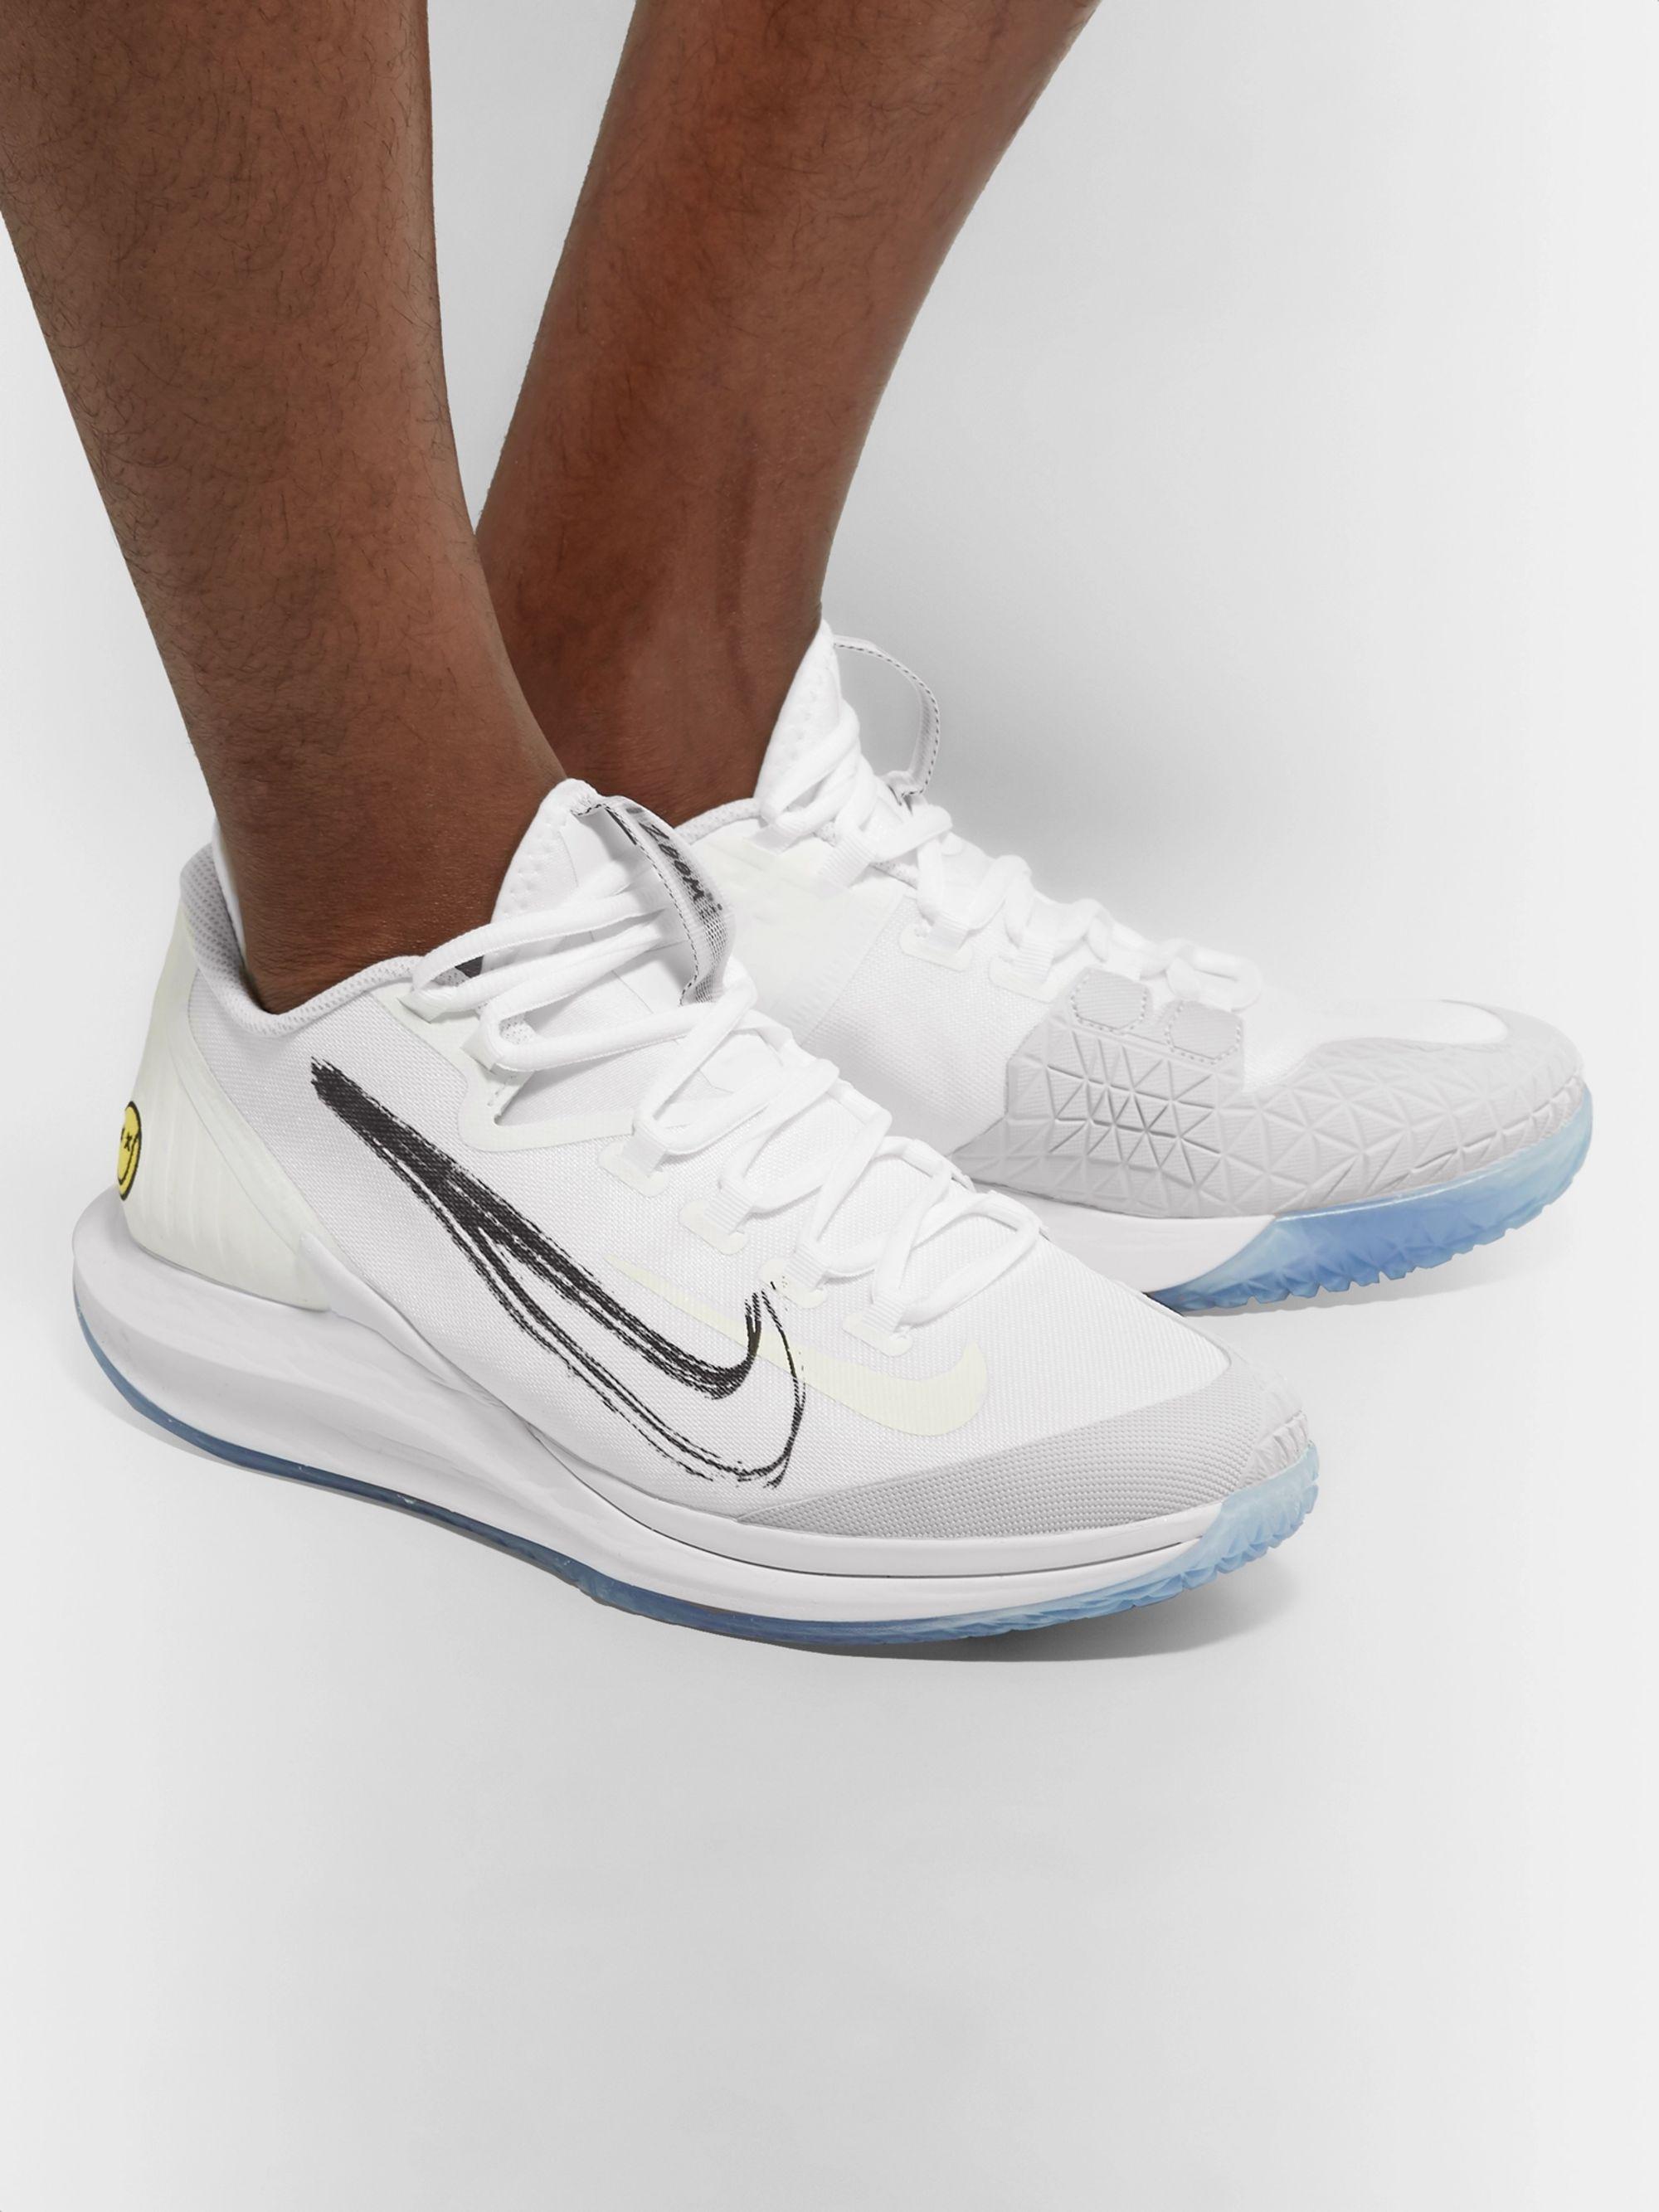 nike zoom zero tennis shoe63% OFF Nike Vapormax plus colors